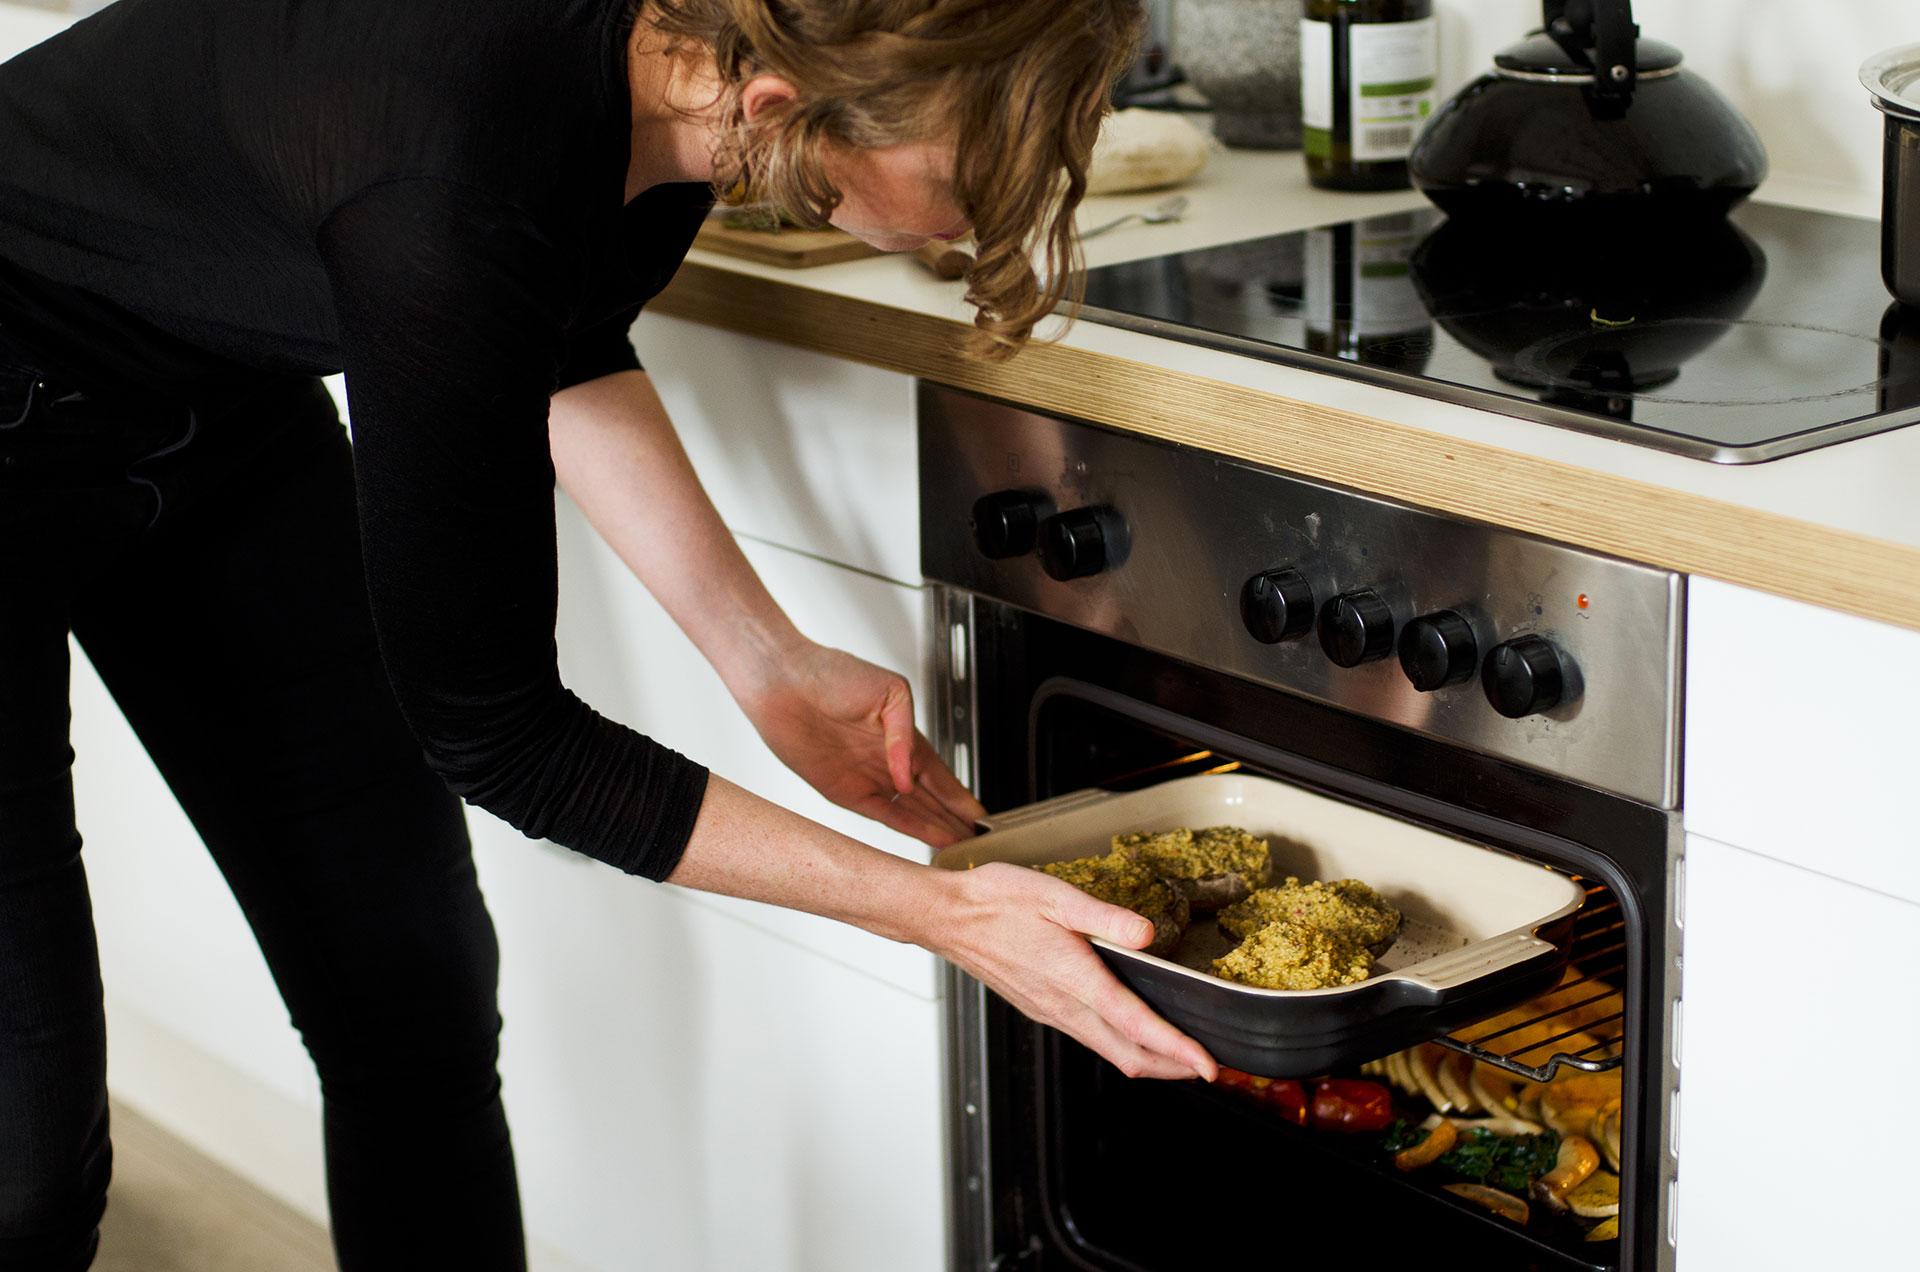 Alanna-Lawley-foodadit-founder-portobello-mushroom-recipe